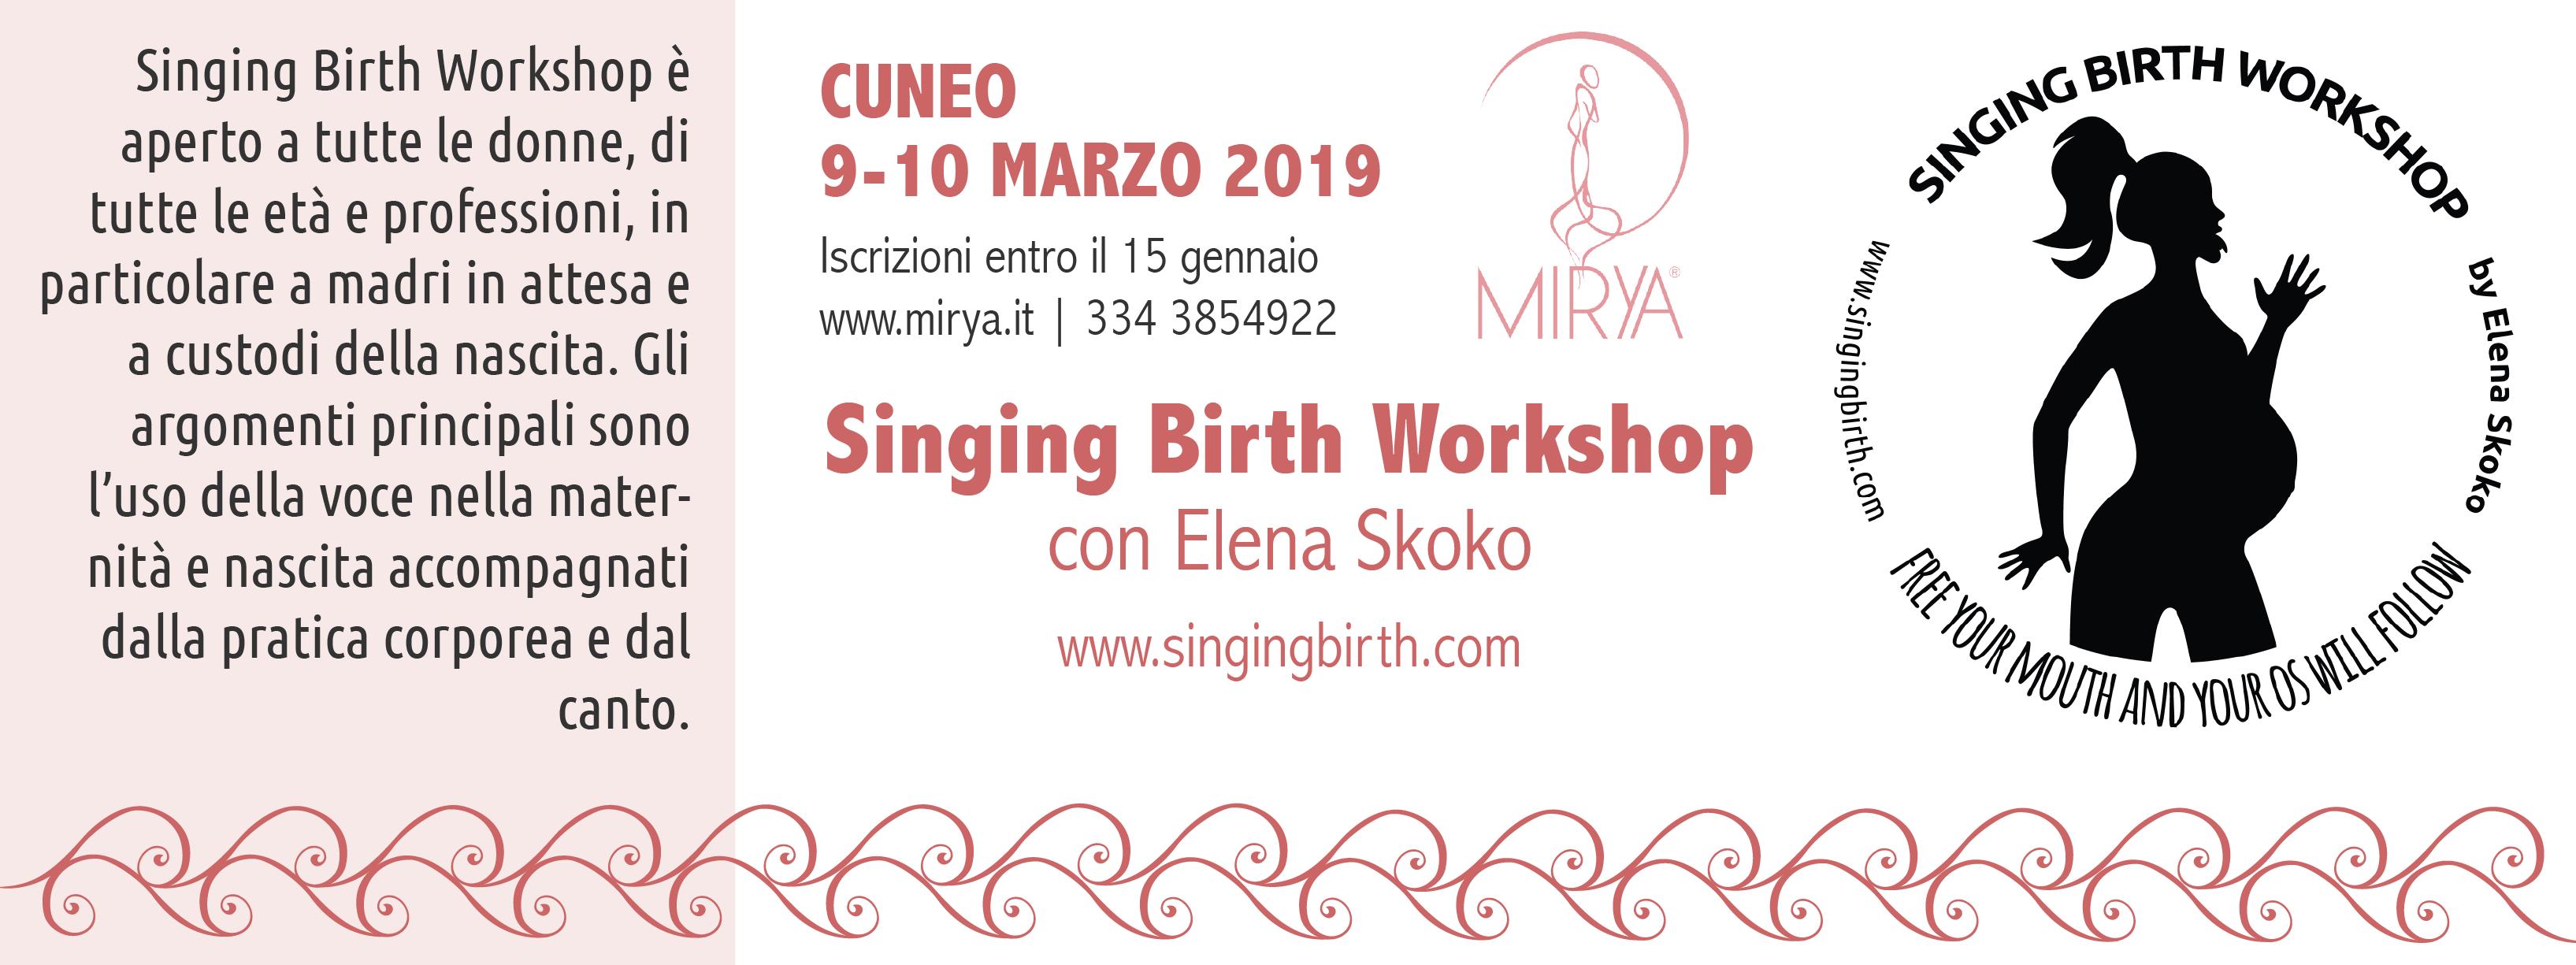 SBW Cuneo 2019